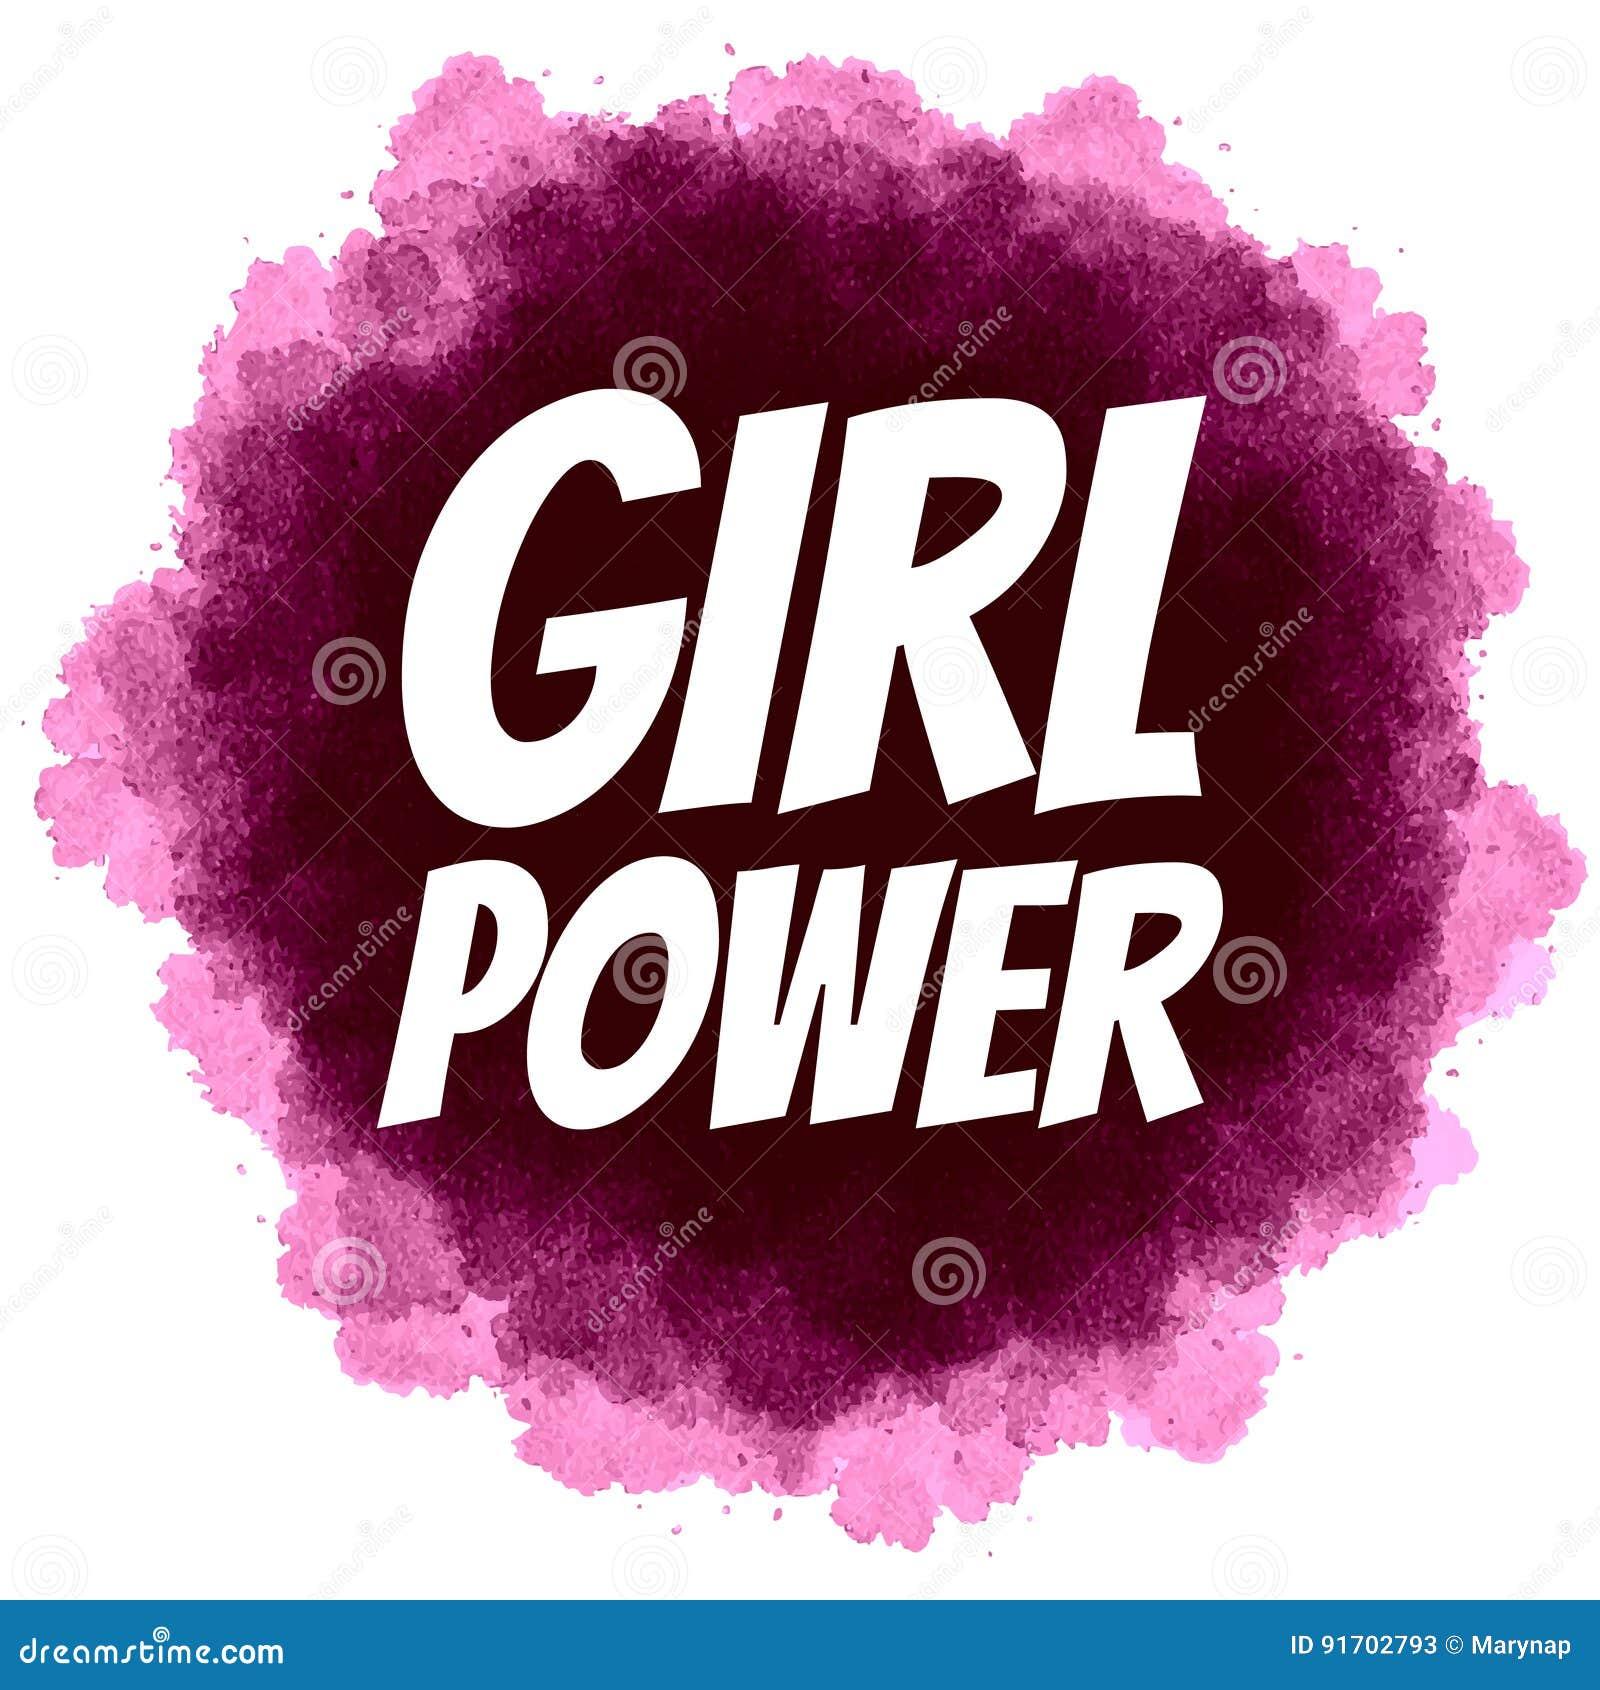 Girl Power Feminist Slogan On Digital Watercolor